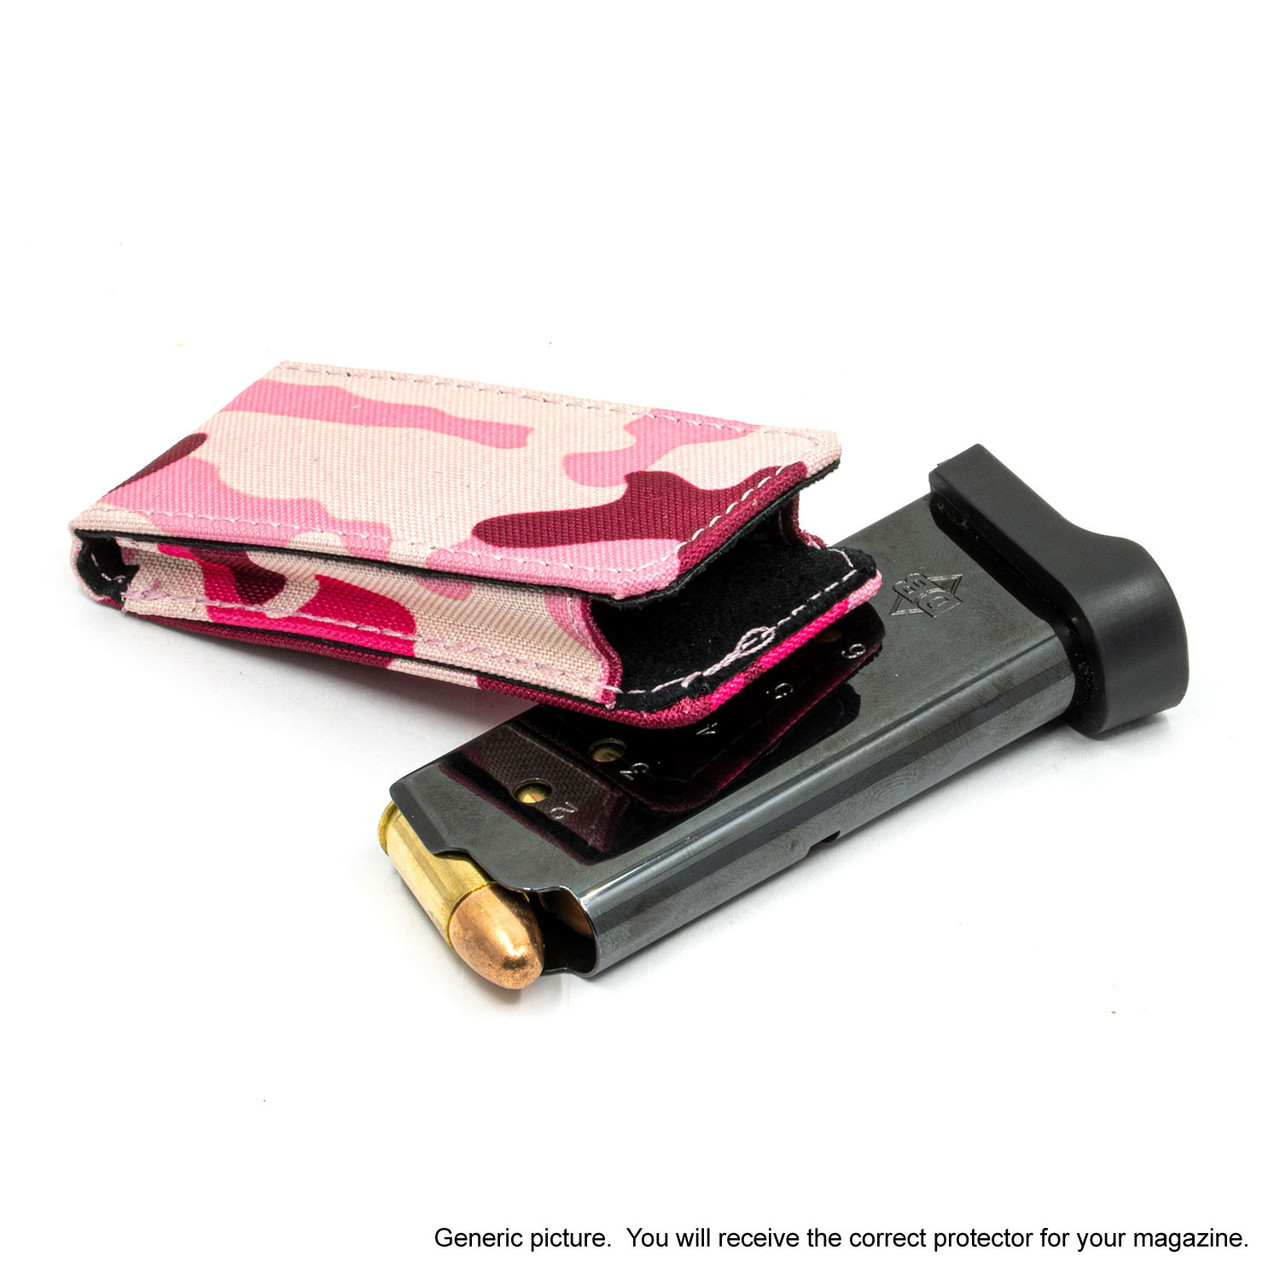 Colt Mark IV Series 80 (.380) Pink Camouflage Magazine Pocket Protector